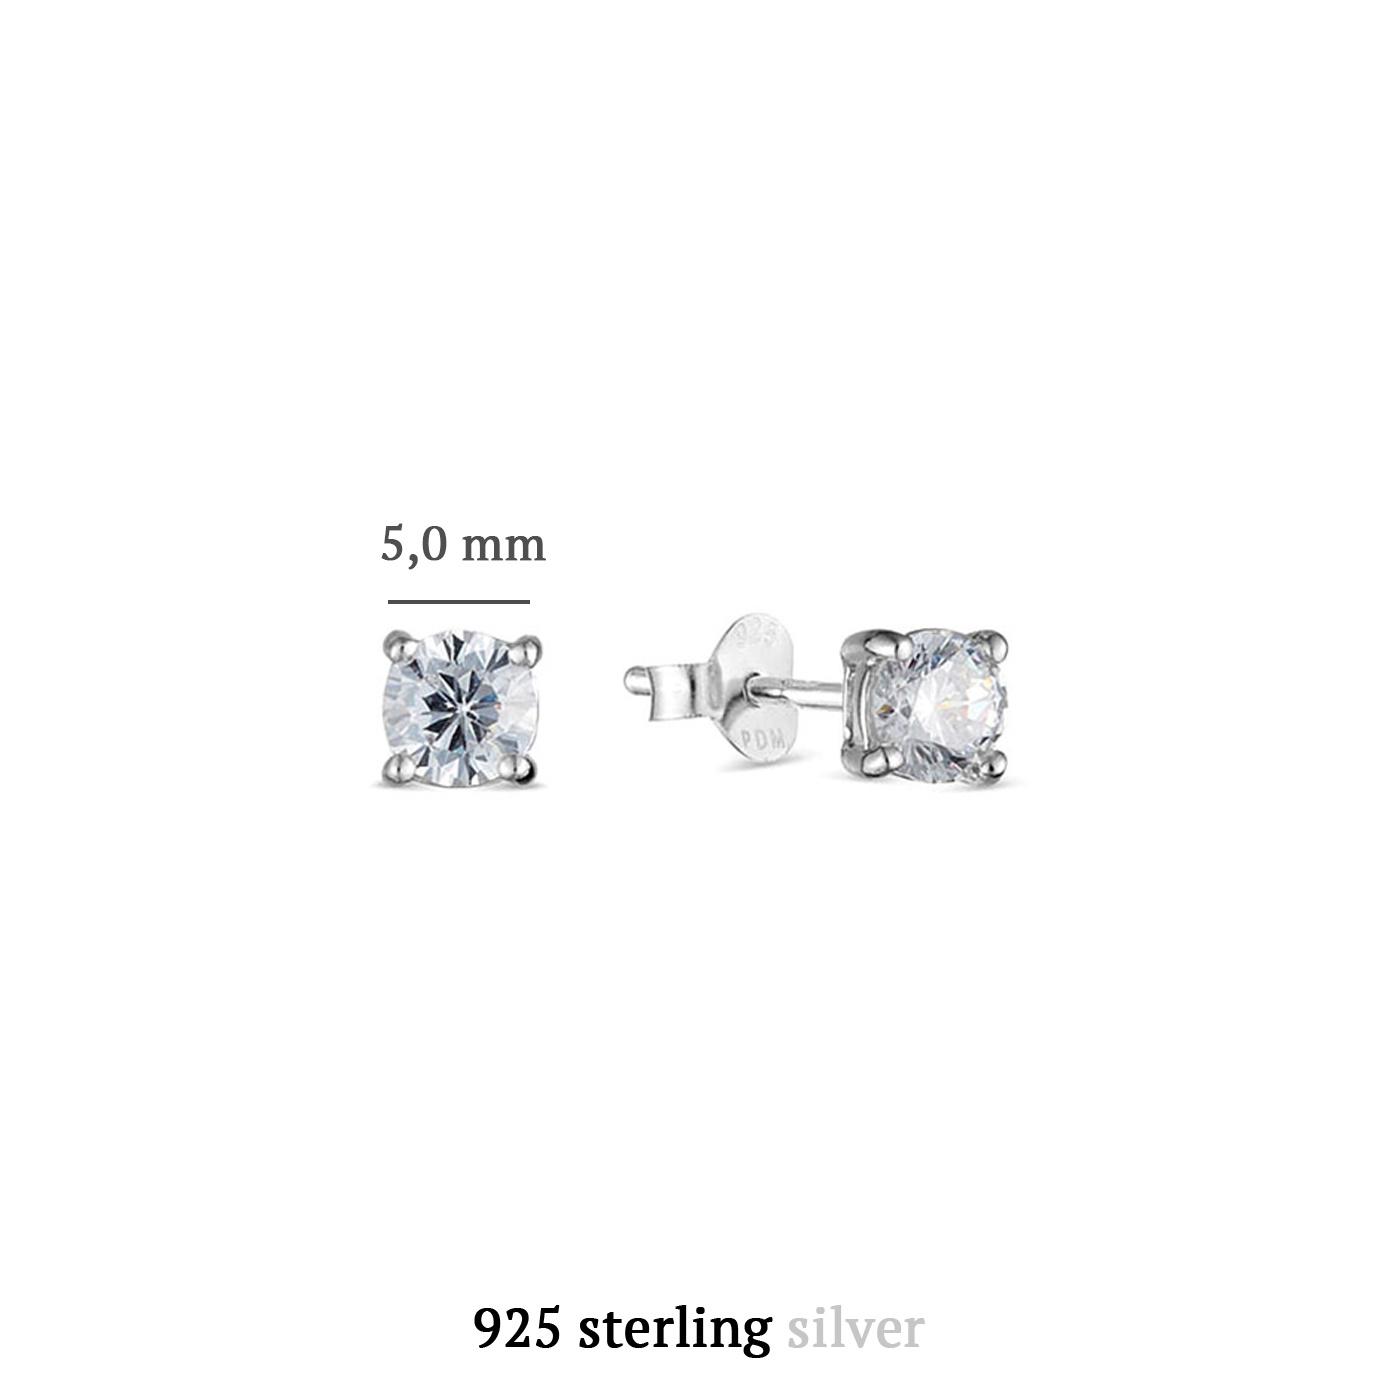 Parte di Me Sorprendimi 925 sterling silver set of 3 pairs of earrings